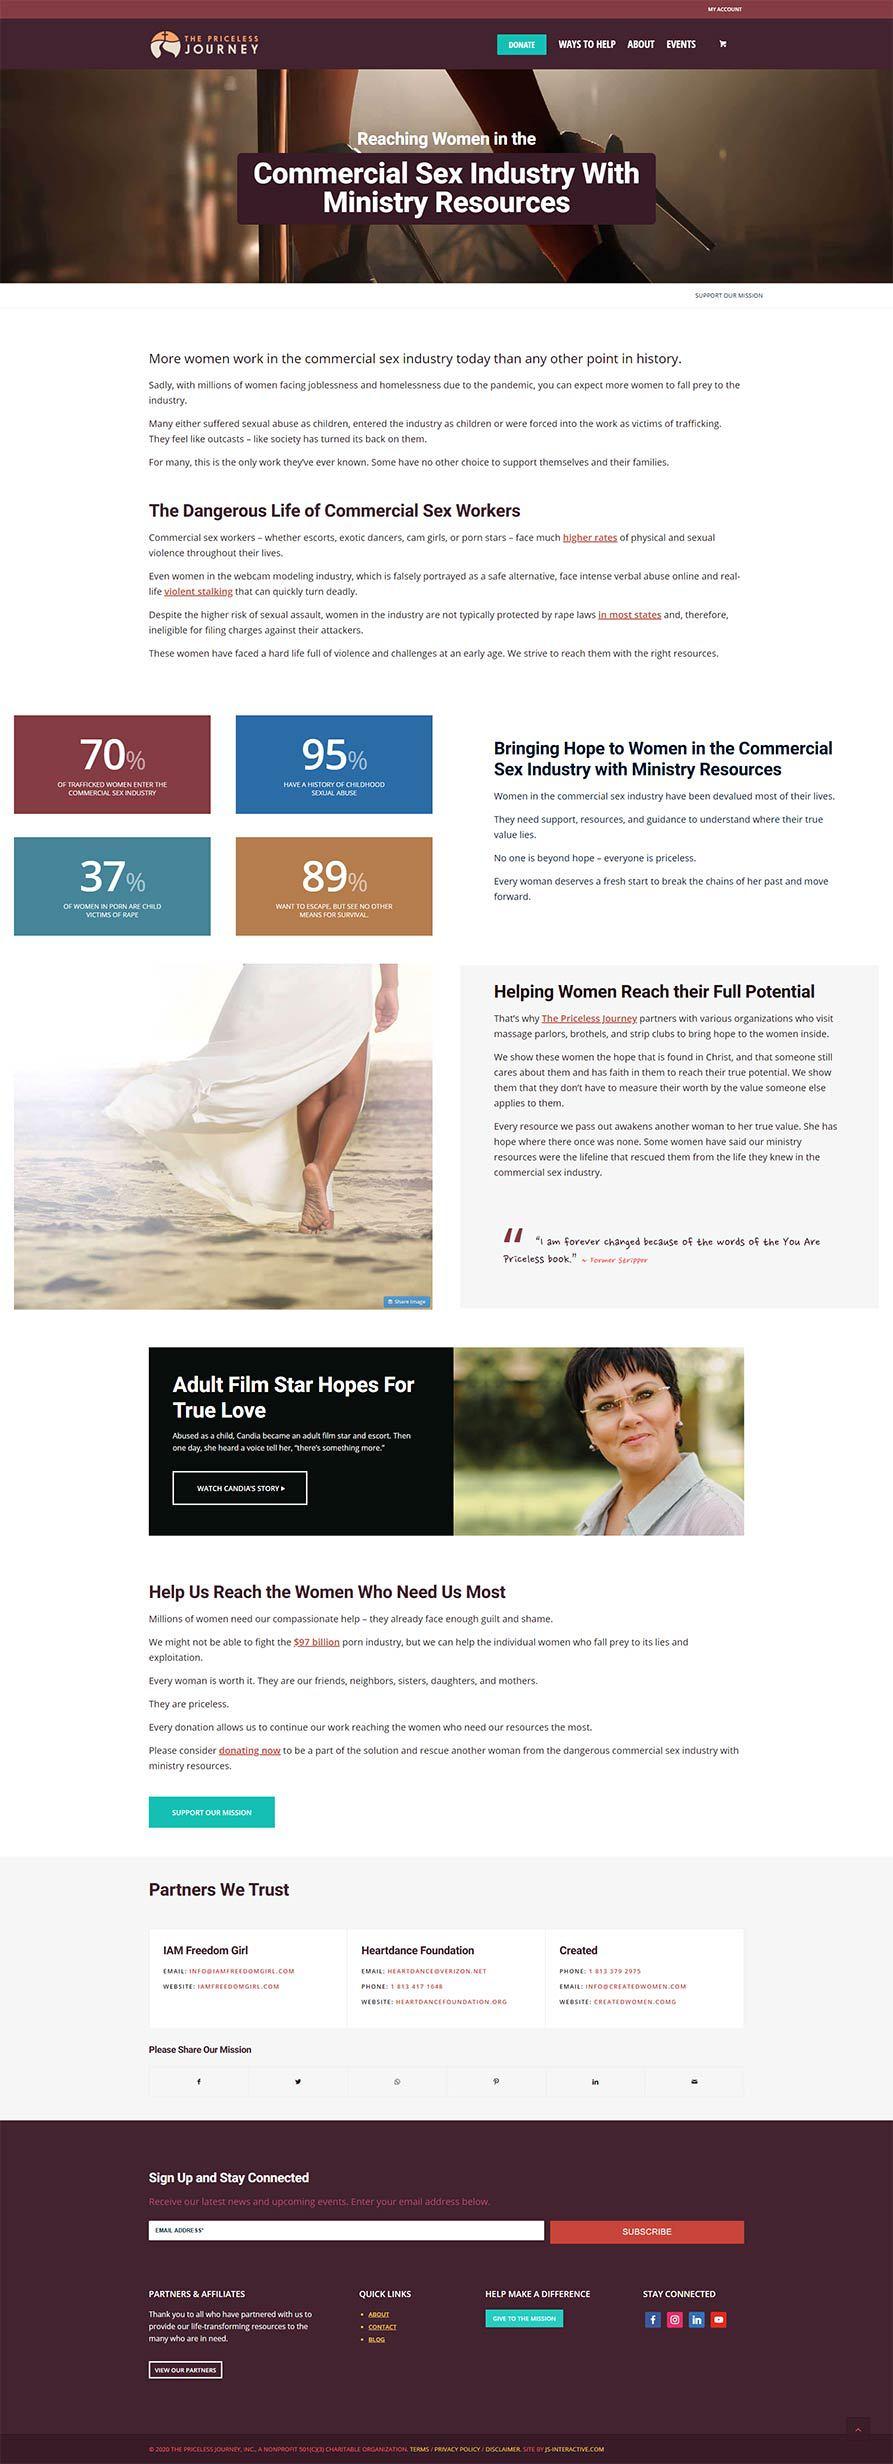 the priceless journey web design